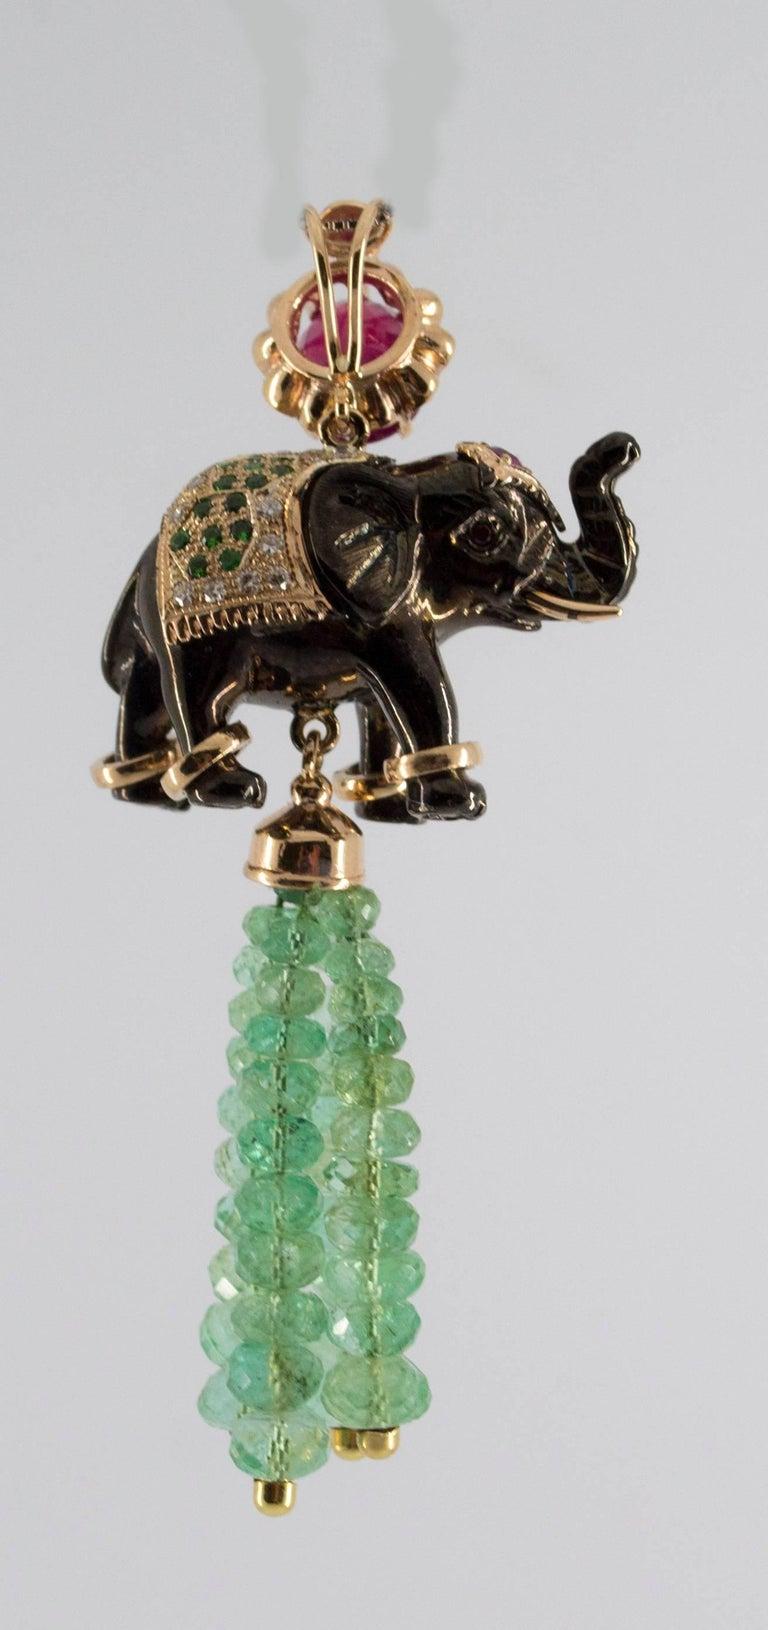 19.90 Carat Emerald 3.10 Carat Ruby Tsavorite Yellow Gold Elephant Pendant For Sale 5